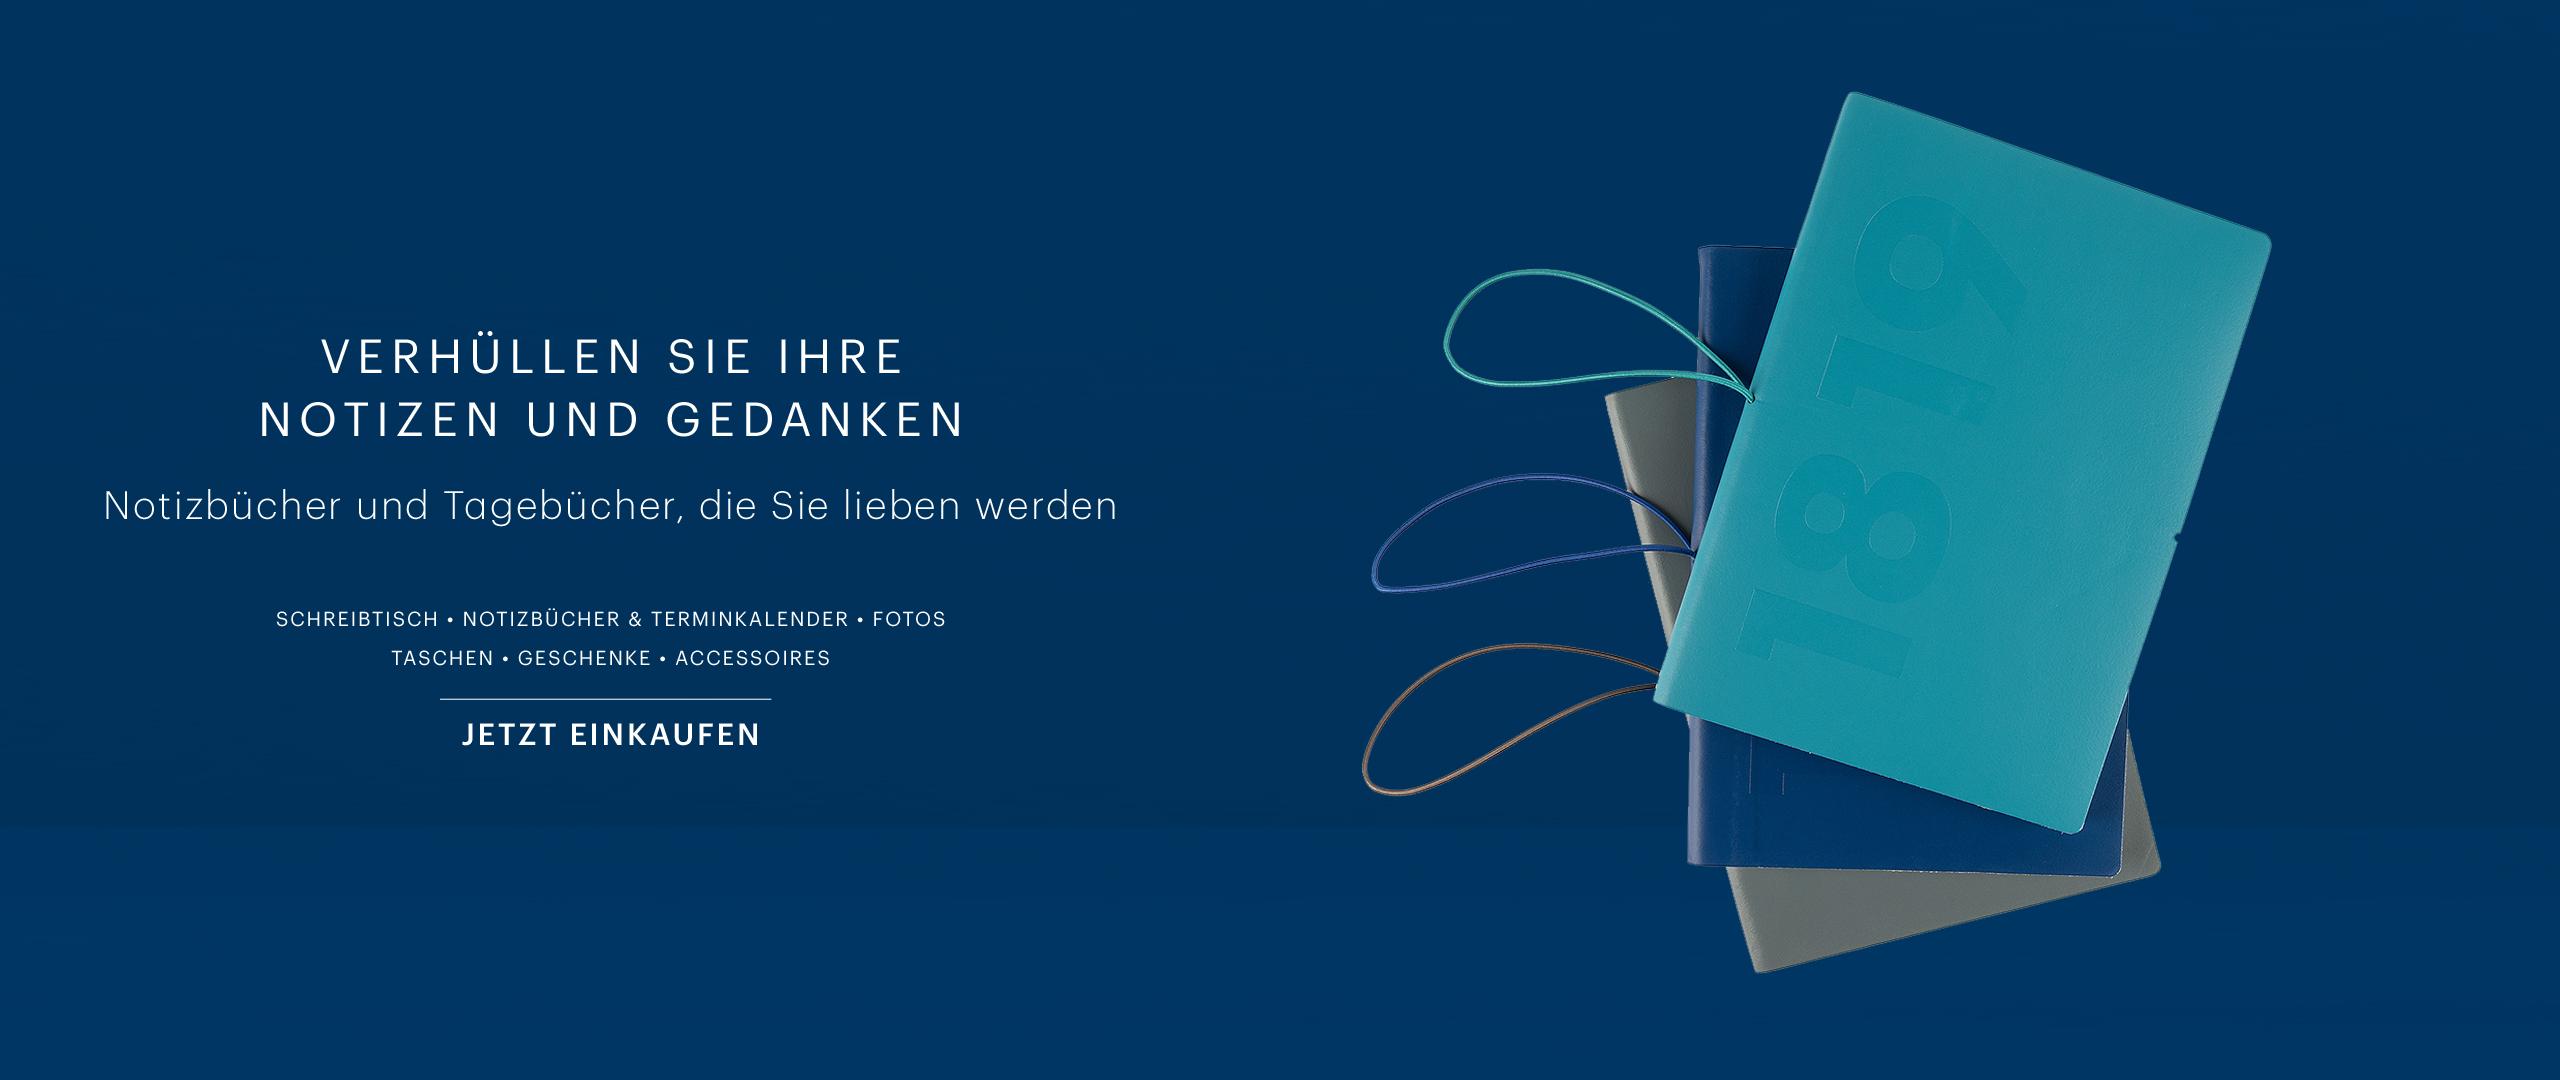 O&R - BEU [DE] - Wrap Your Notes & Thoughts 2